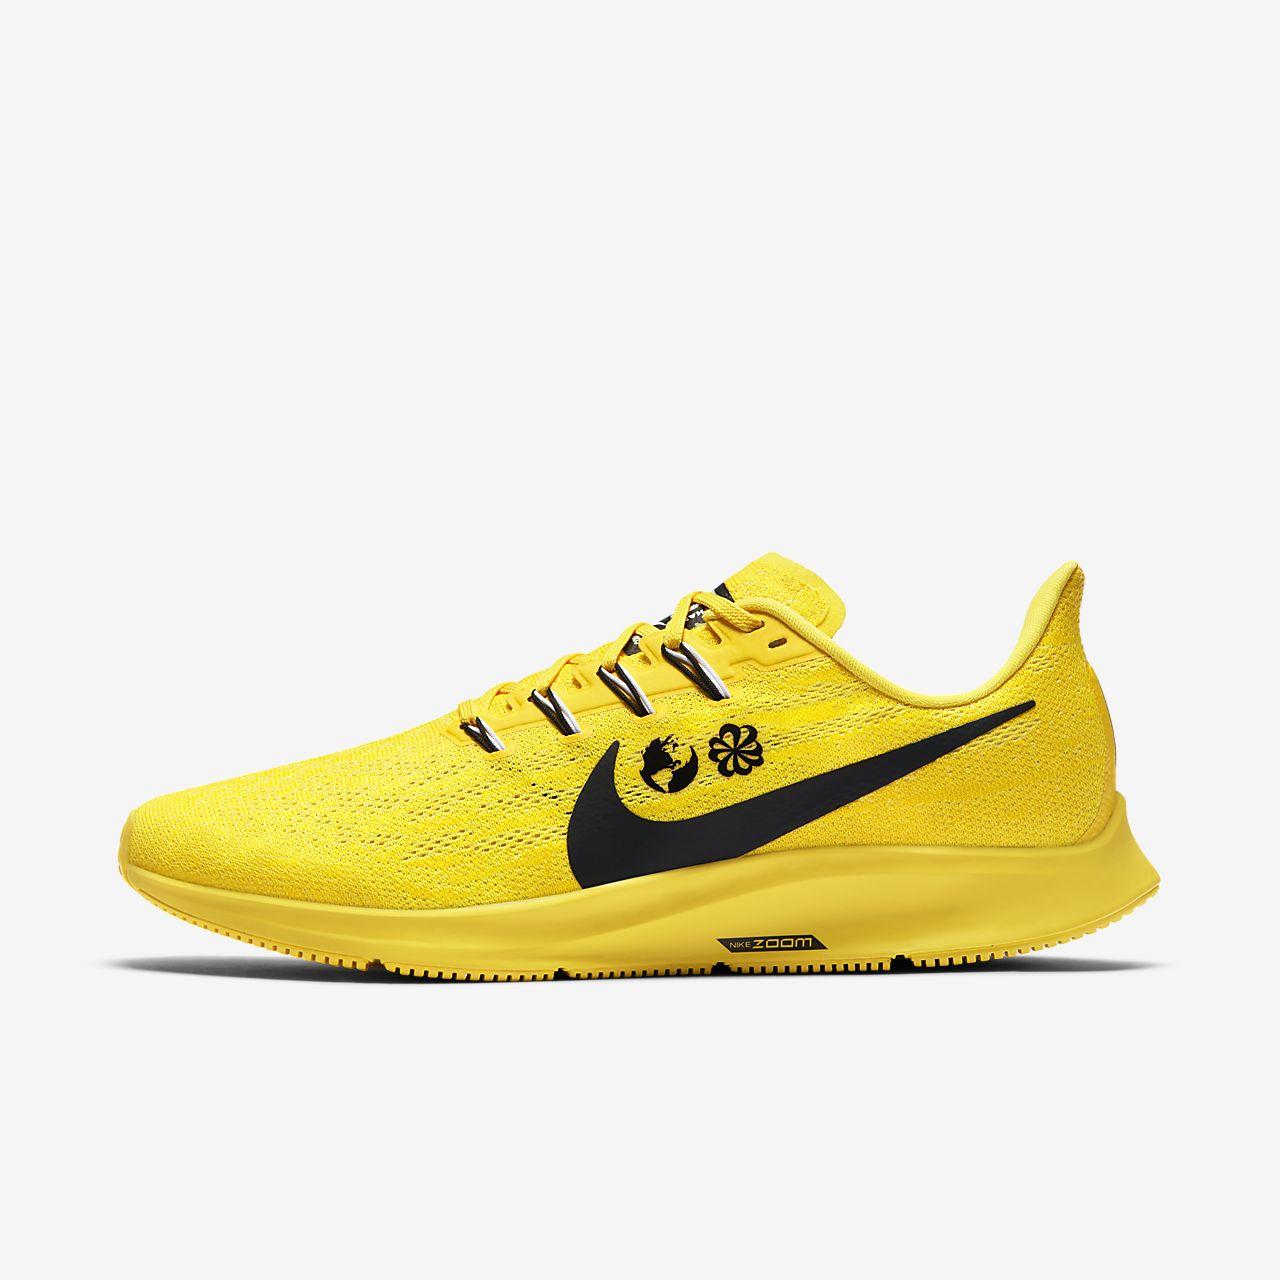 100% authentic 24673 995d5 Nike Air Zoom Pegasus 36 A.I.R. Men's Running Shoe